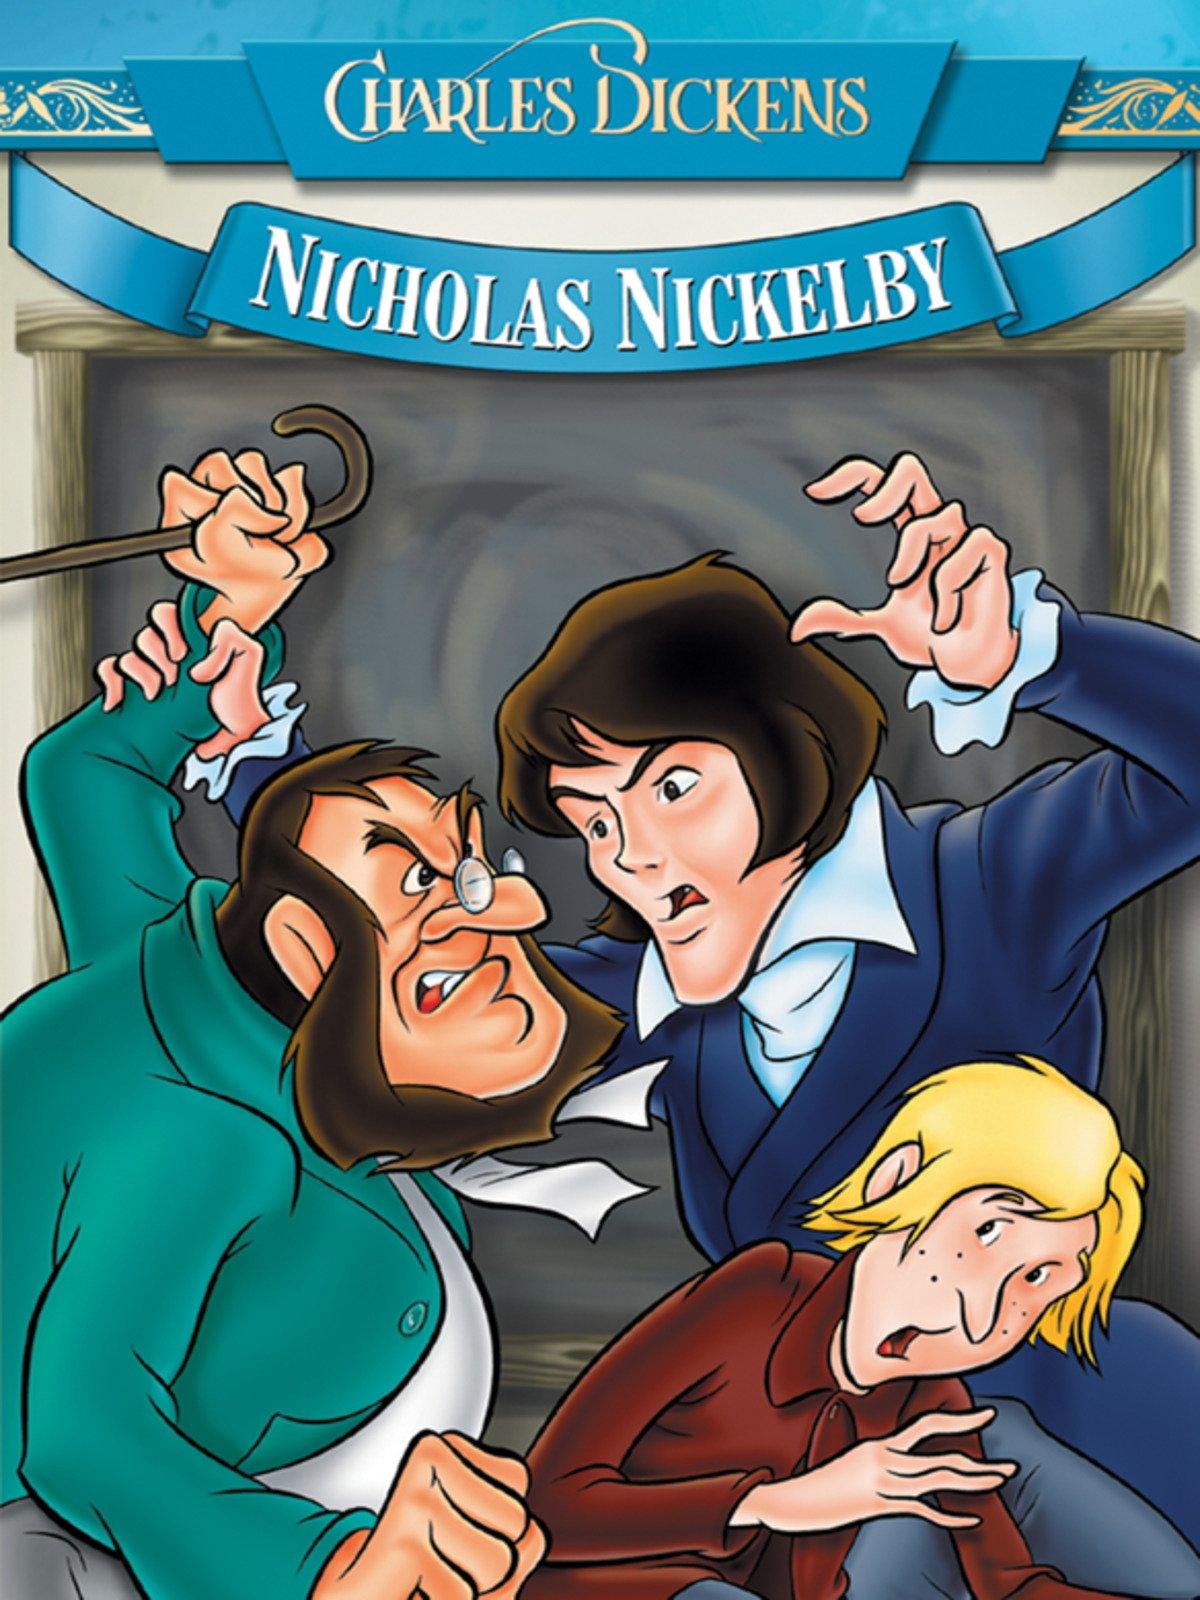 Charles Dickens: Nicholas Nickelby